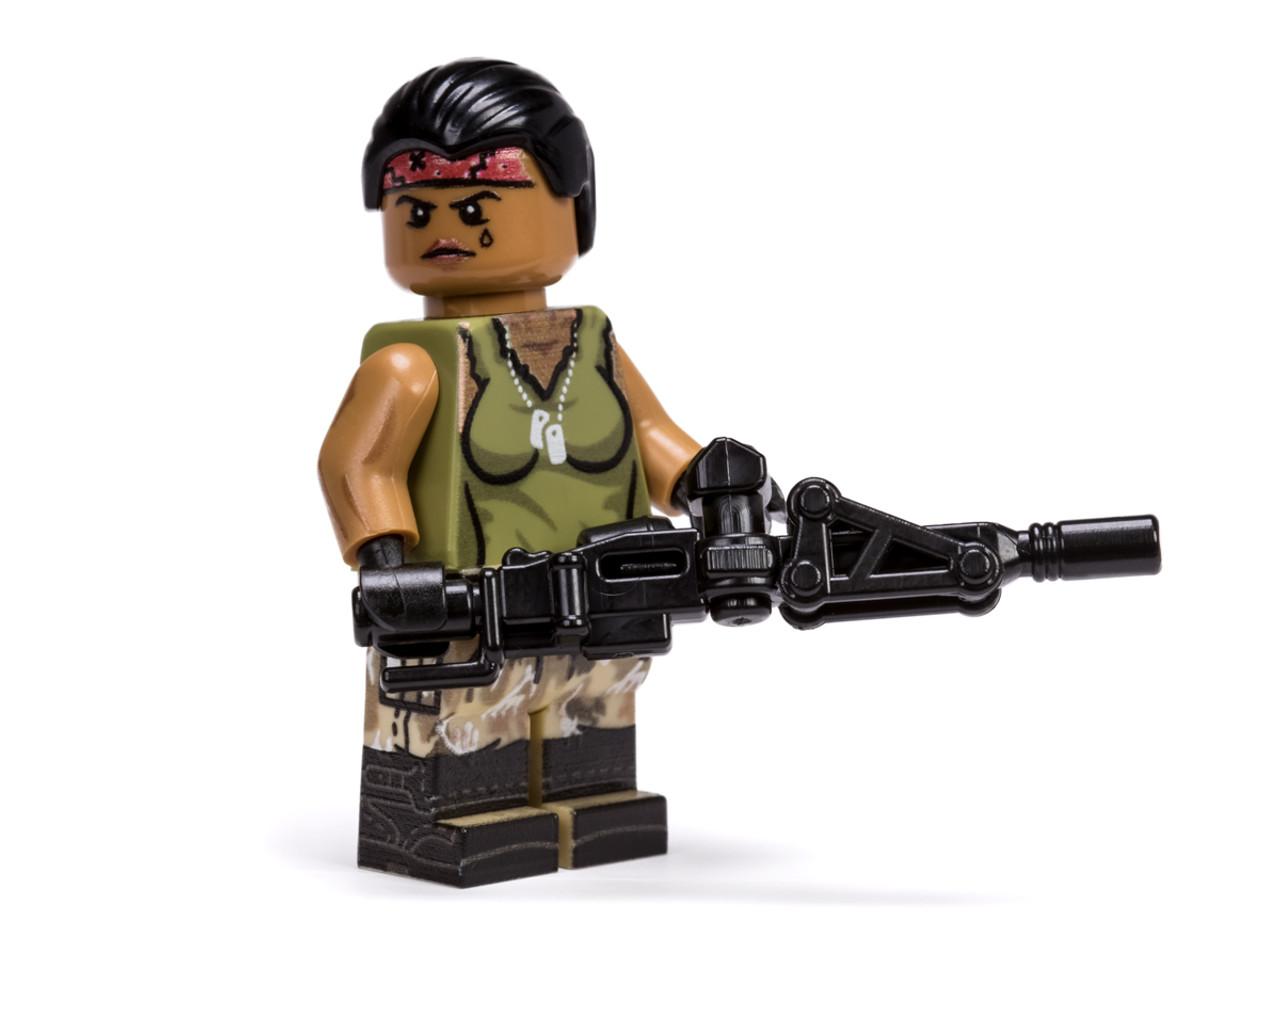 Offworld Marines Smart Gunner